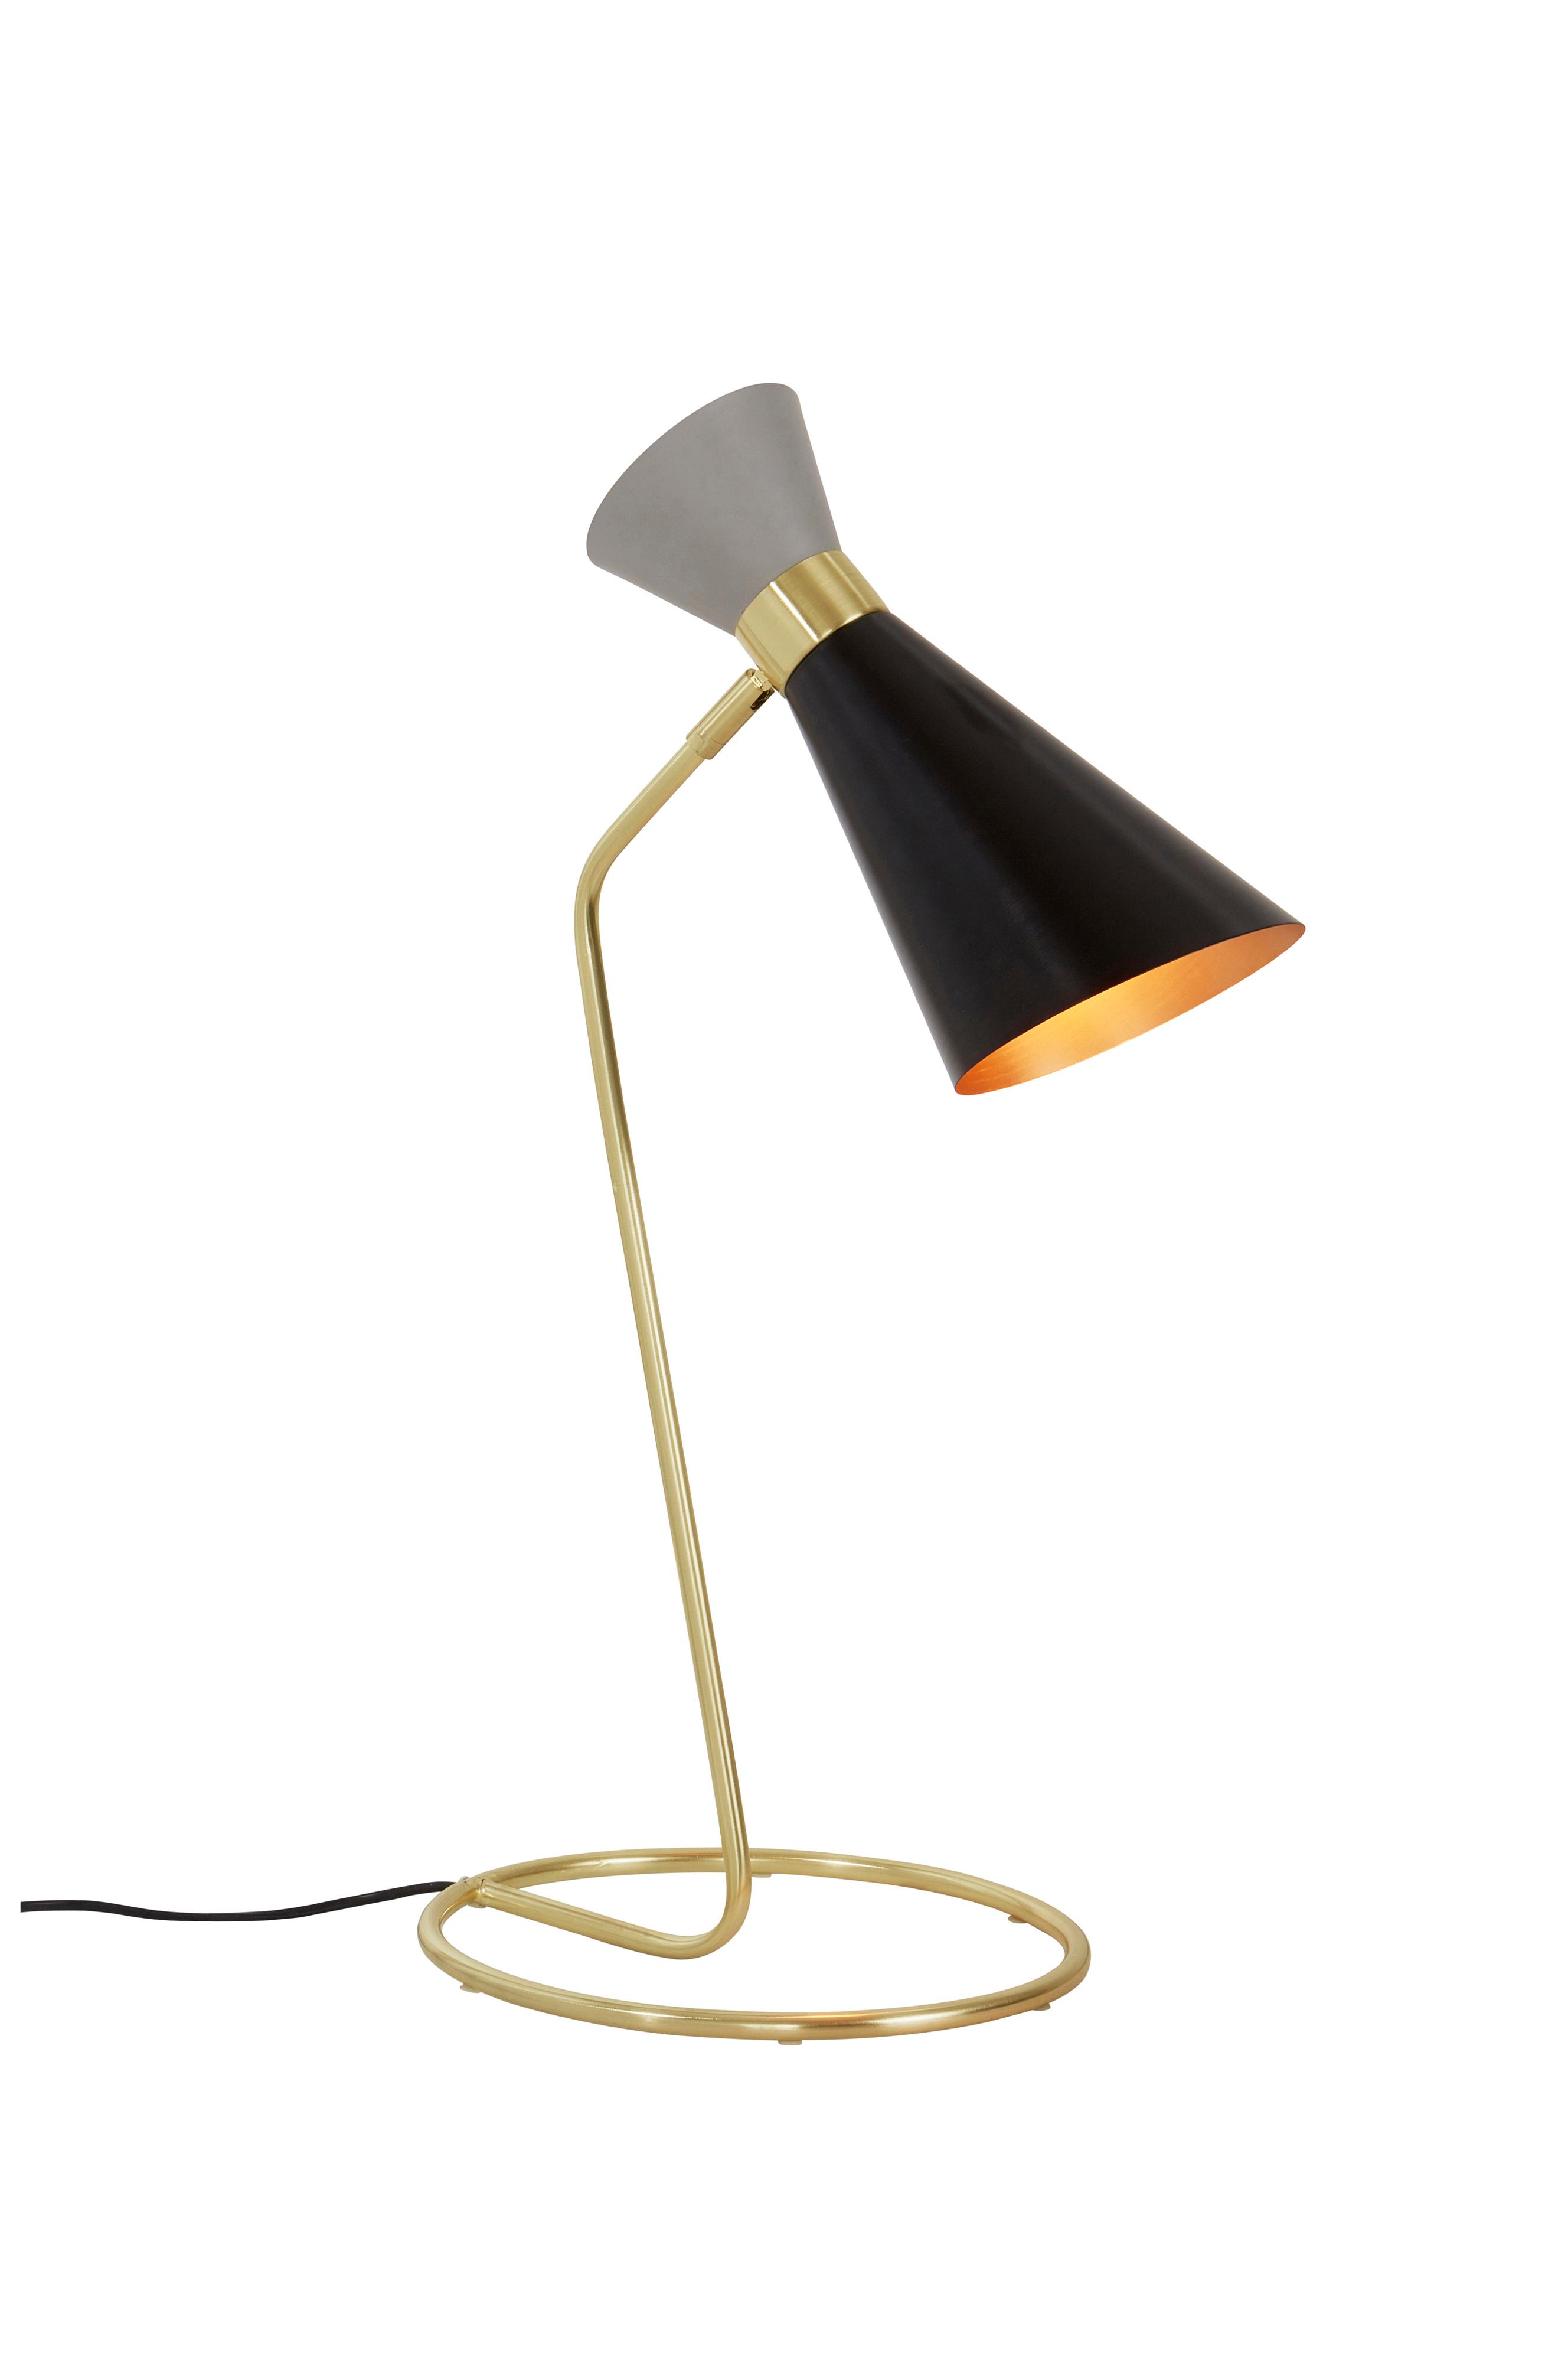 HOUSTON bordslampa | Bordslampa, Sänglampa, Houston